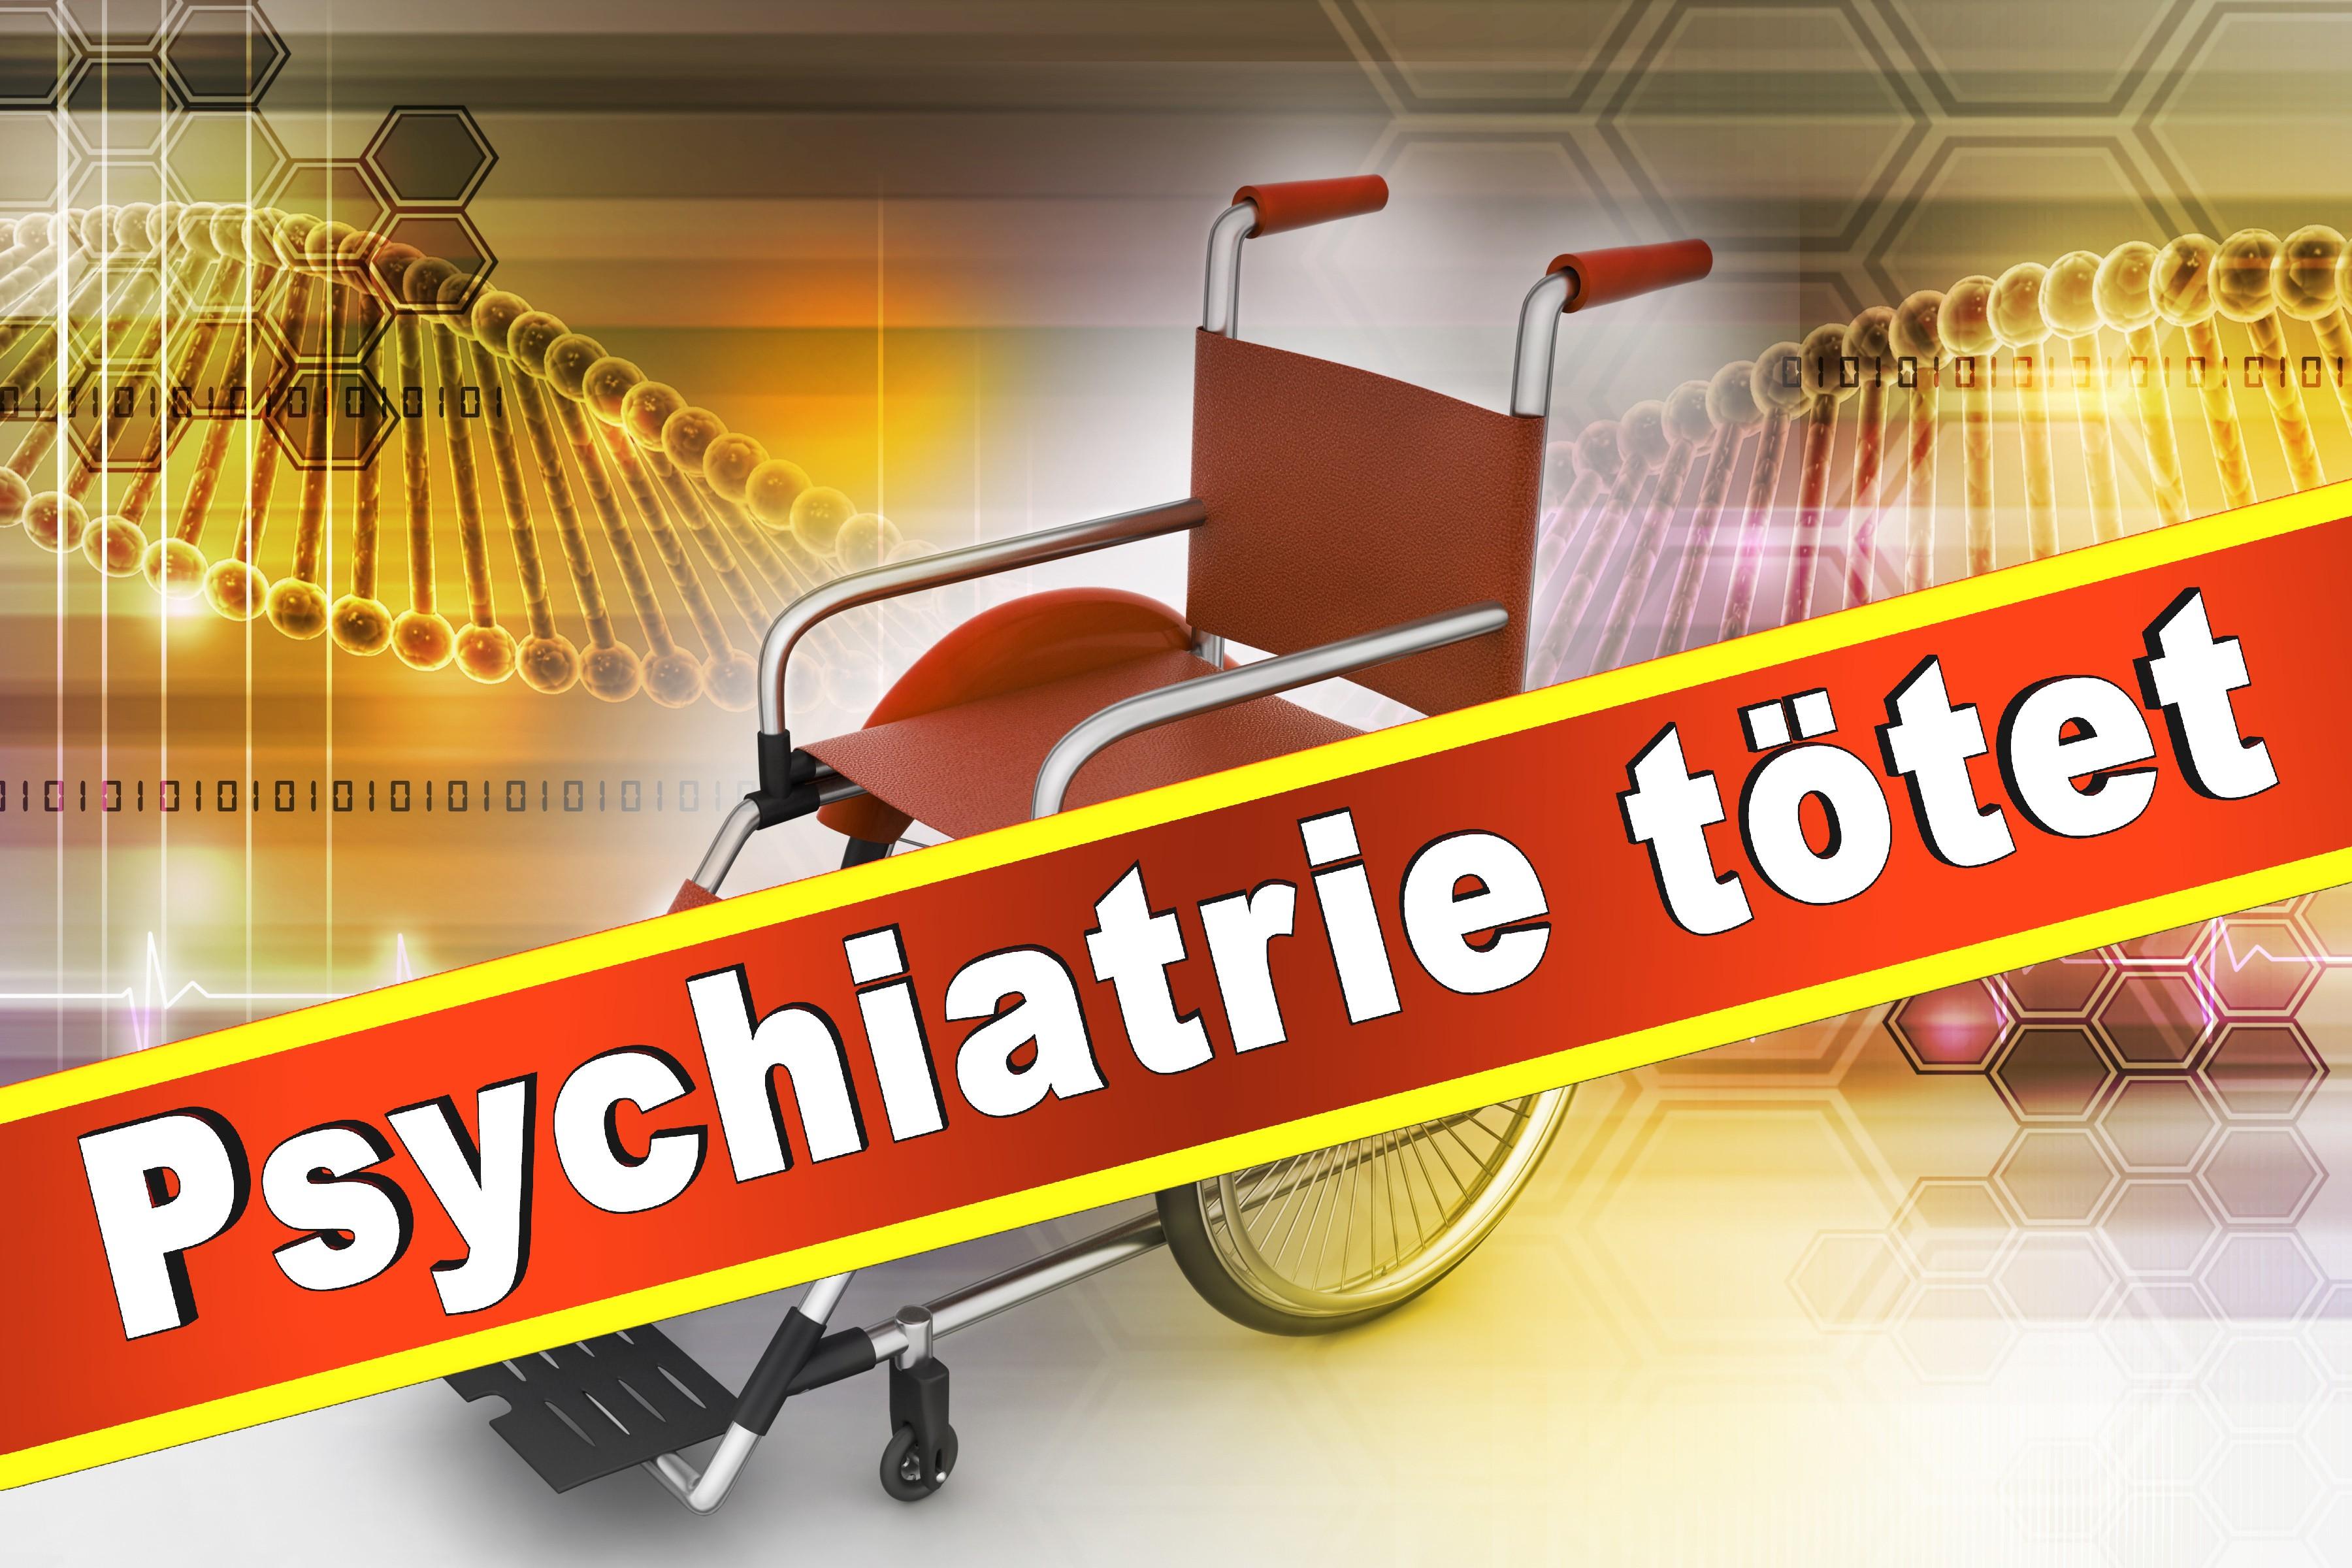 Opferhilfebüro Hannover Crime Victim Service Hannover Gutachten Psychiater Facharzt Psychiatrie